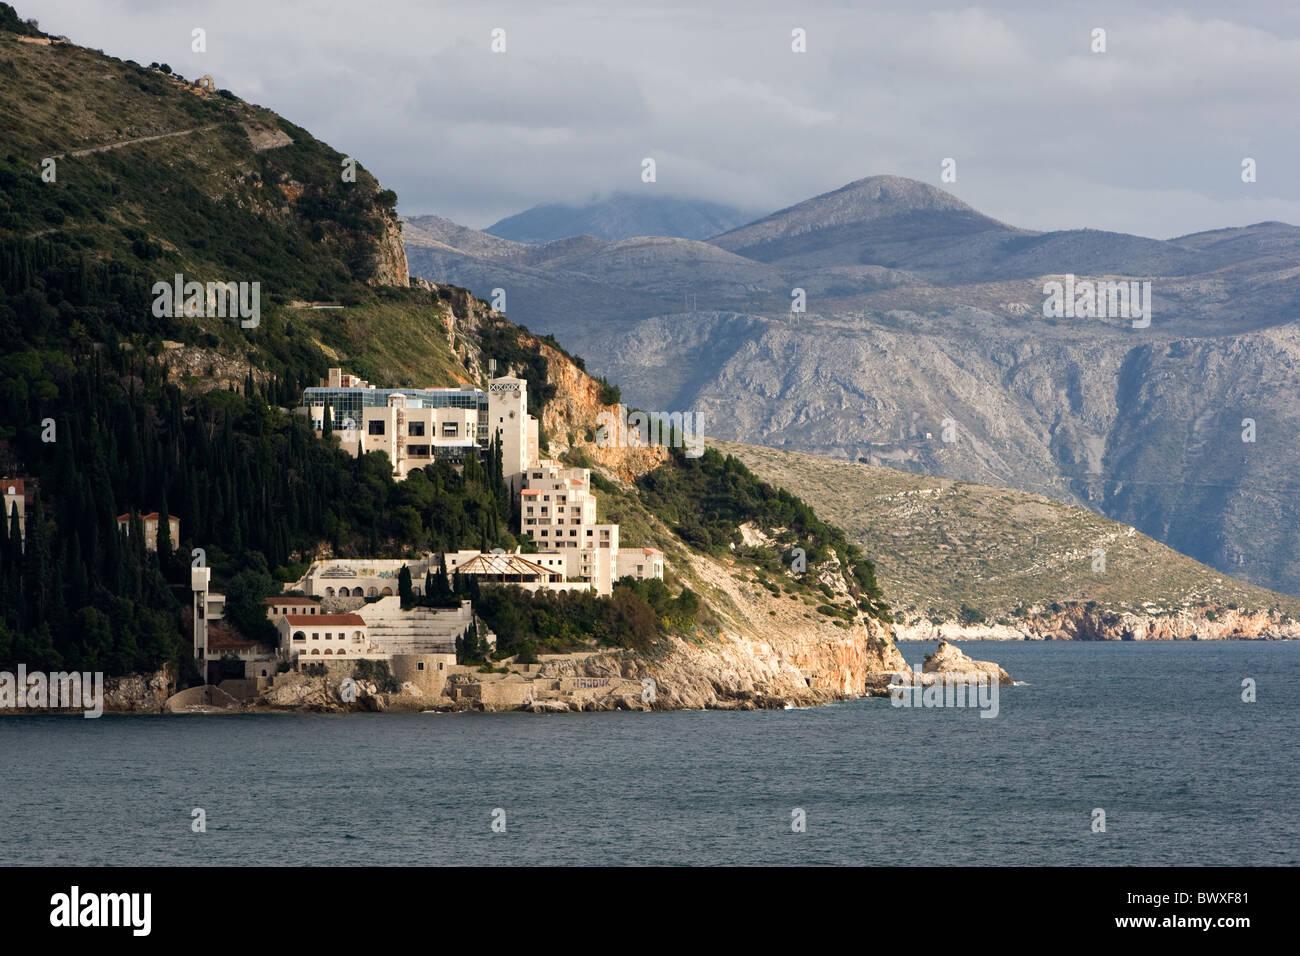 Buildings on the coastline at Dubrovnik, Croatia Stock Photo